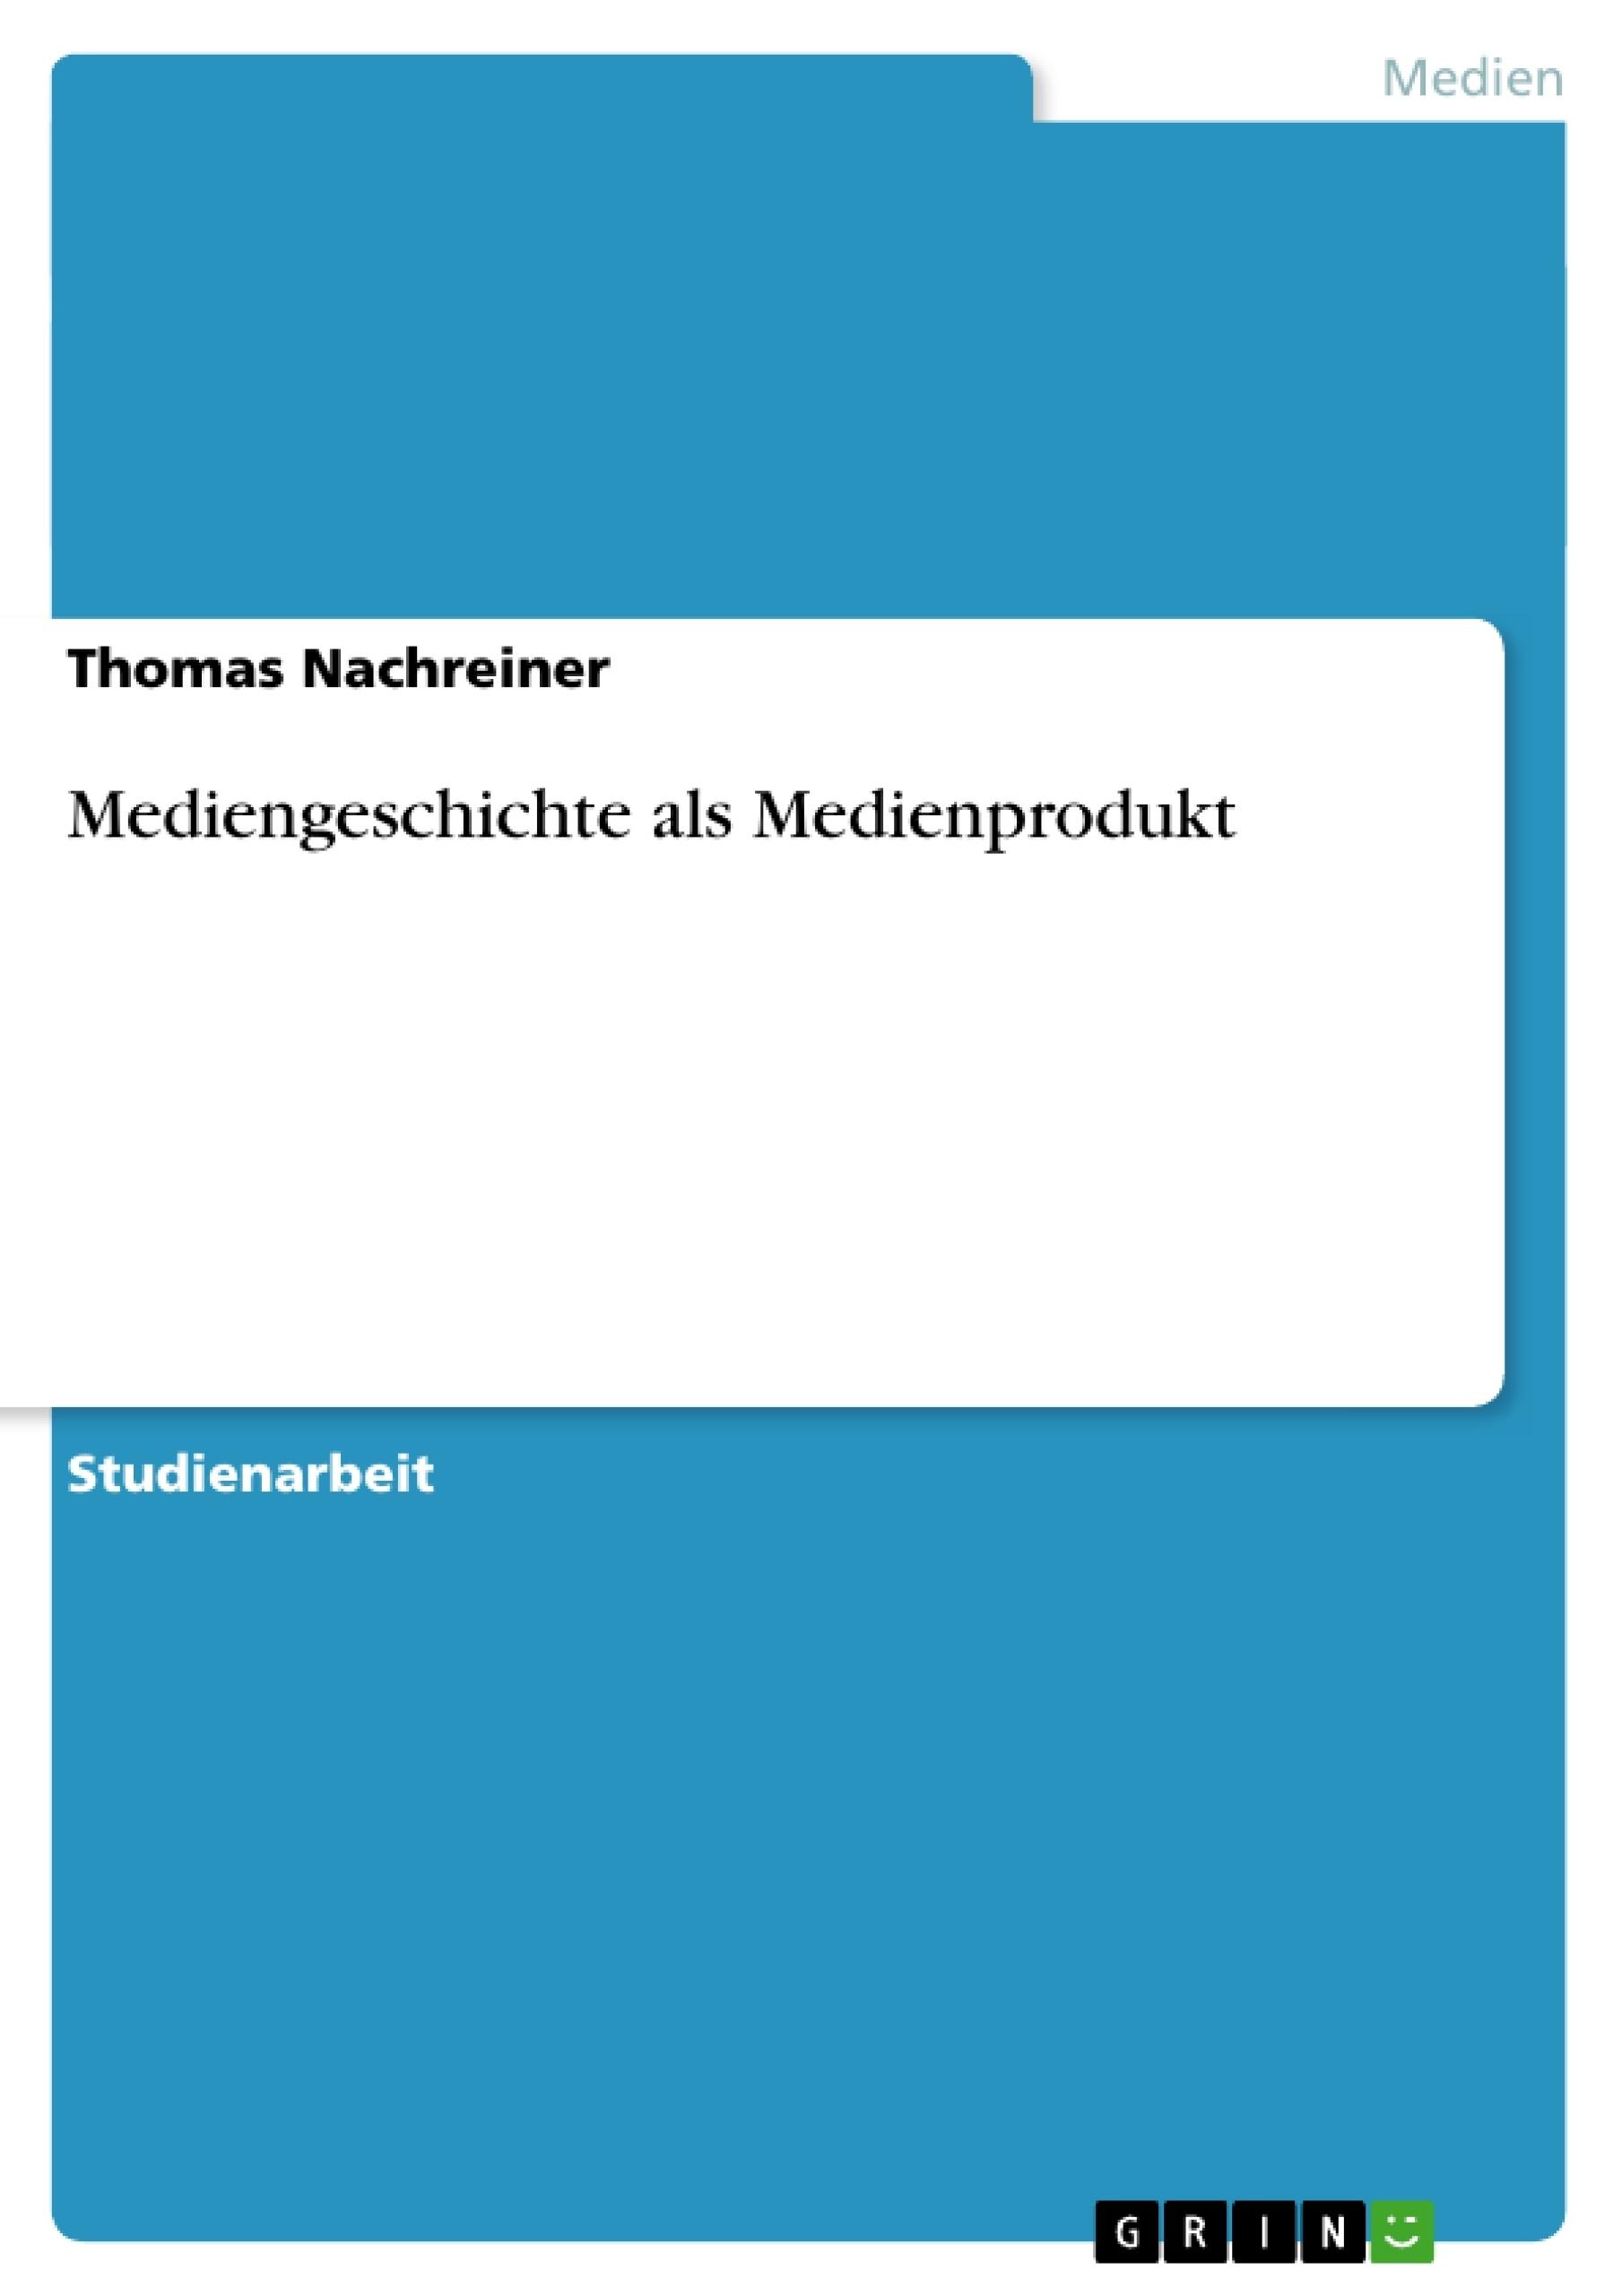 Titel: Mediengeschichte als Medienprodukt